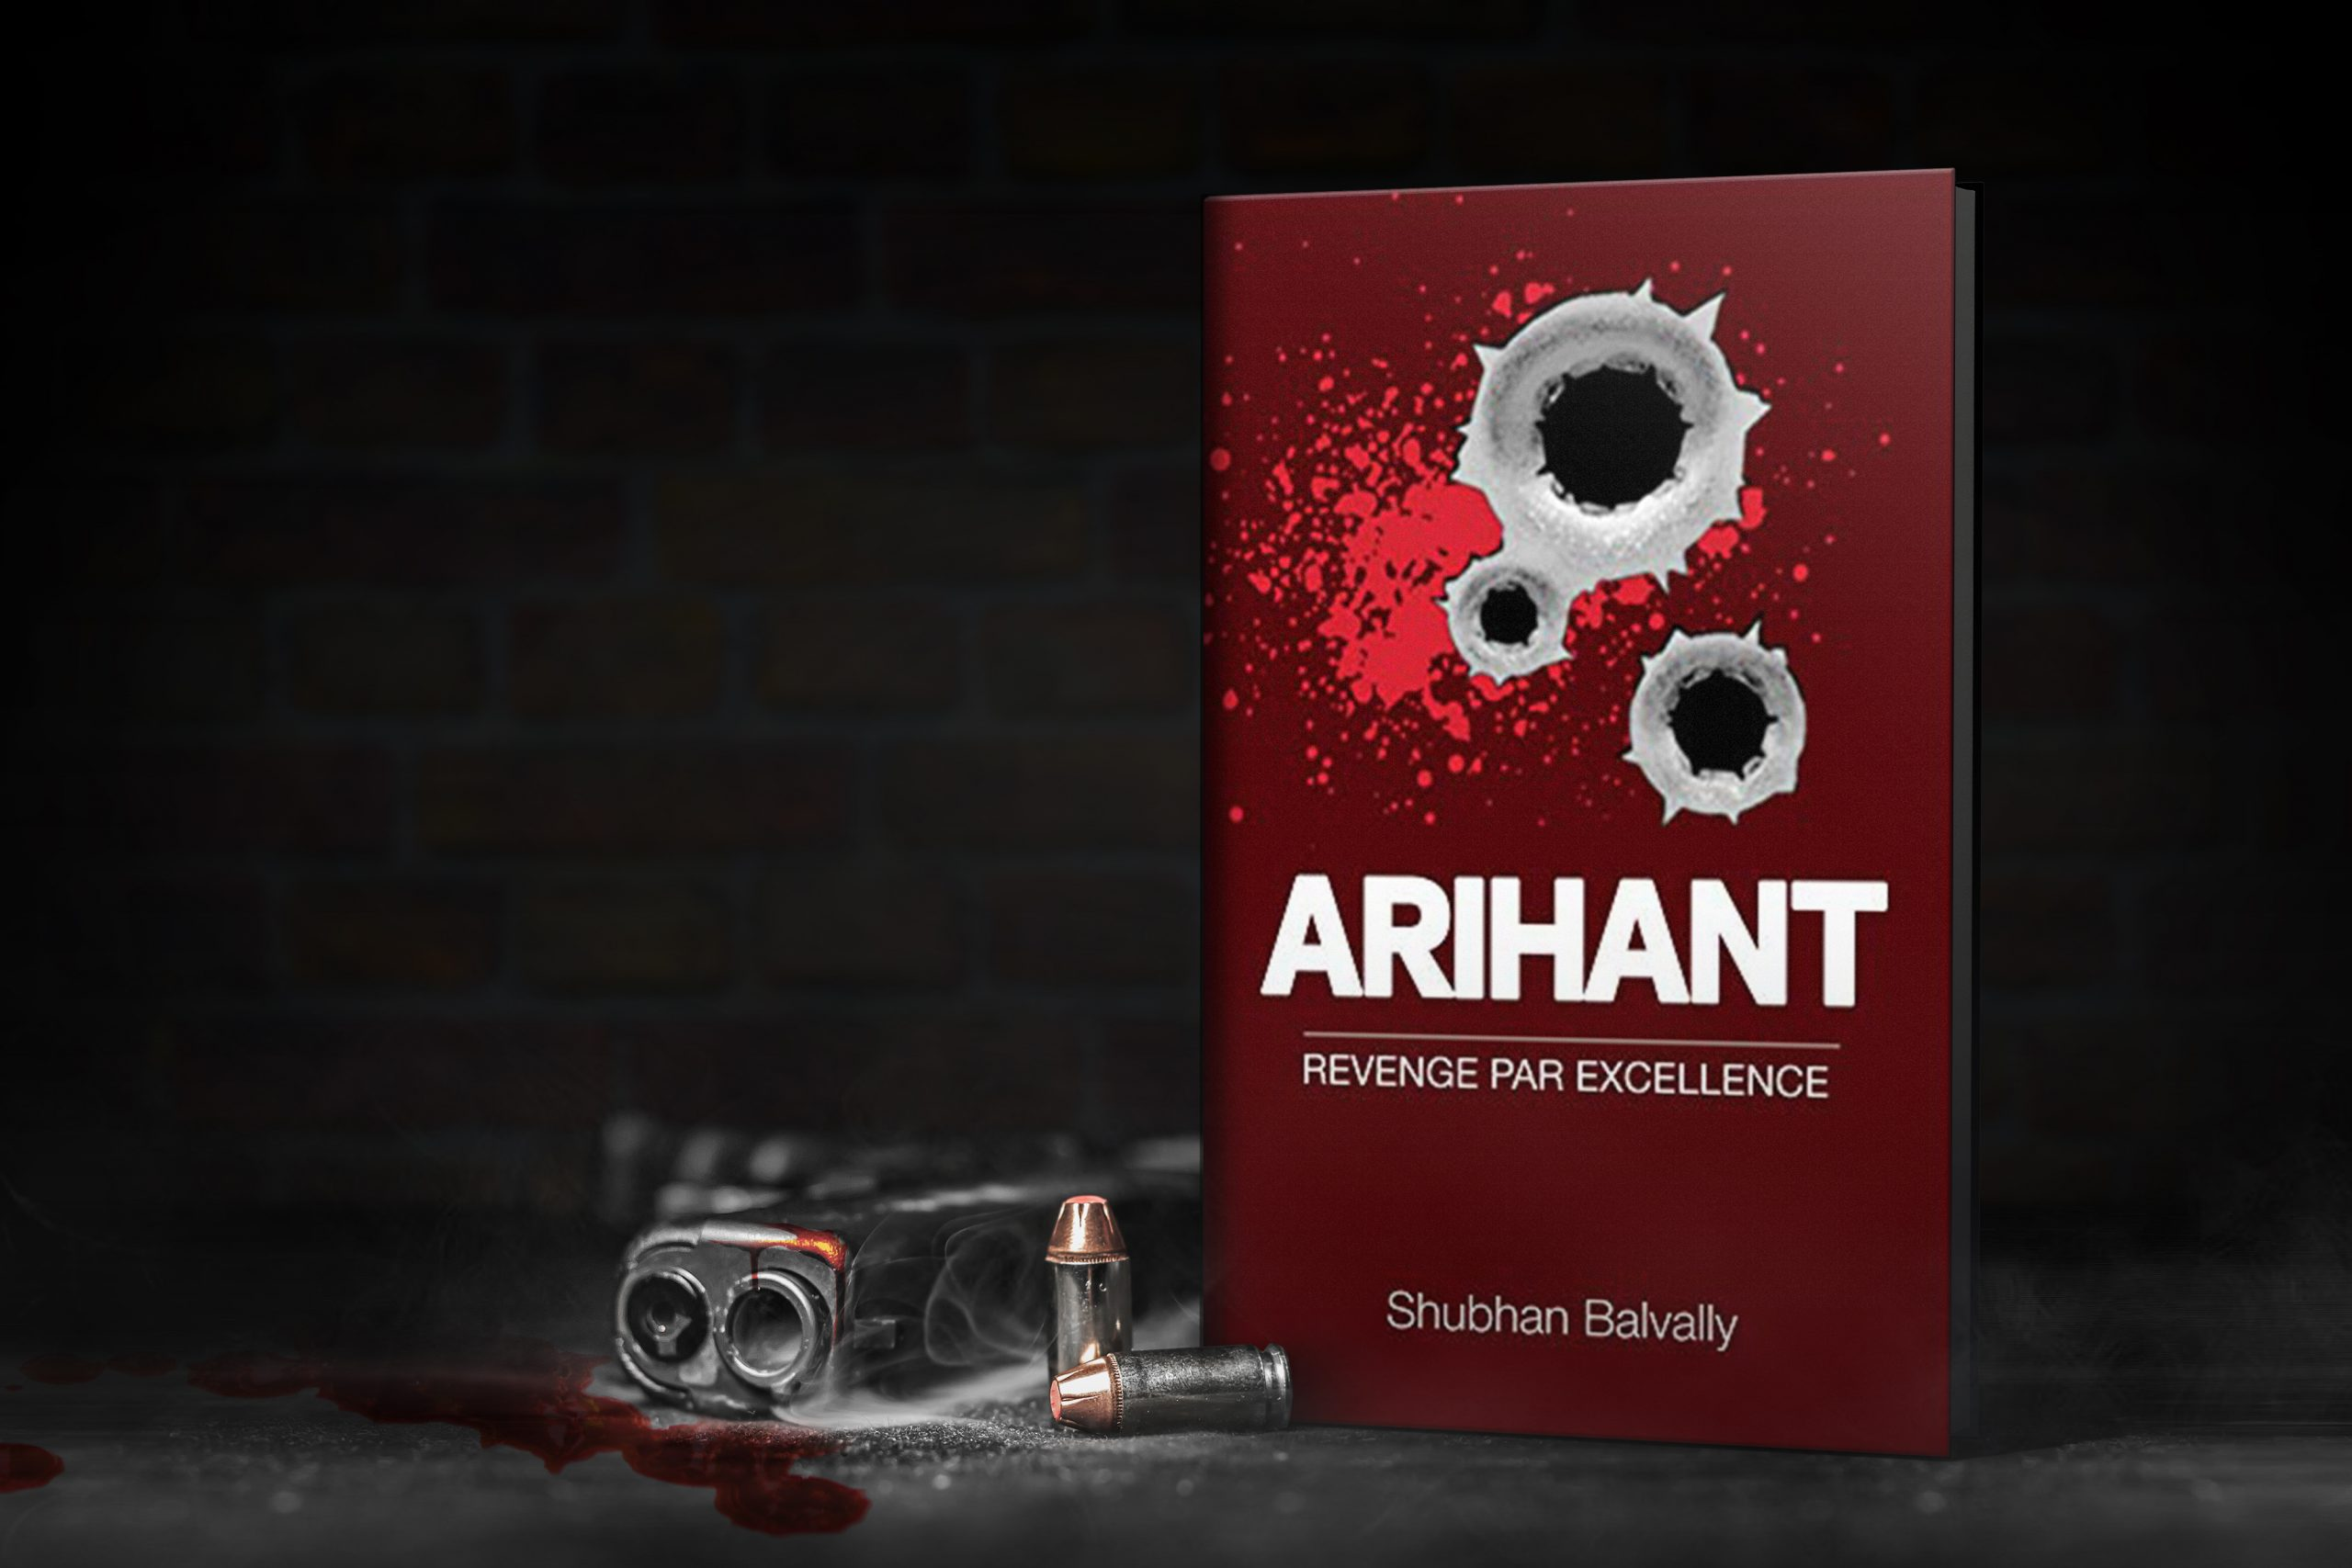 Arihant: Revenge Par Excellence by Shubhan Balvally